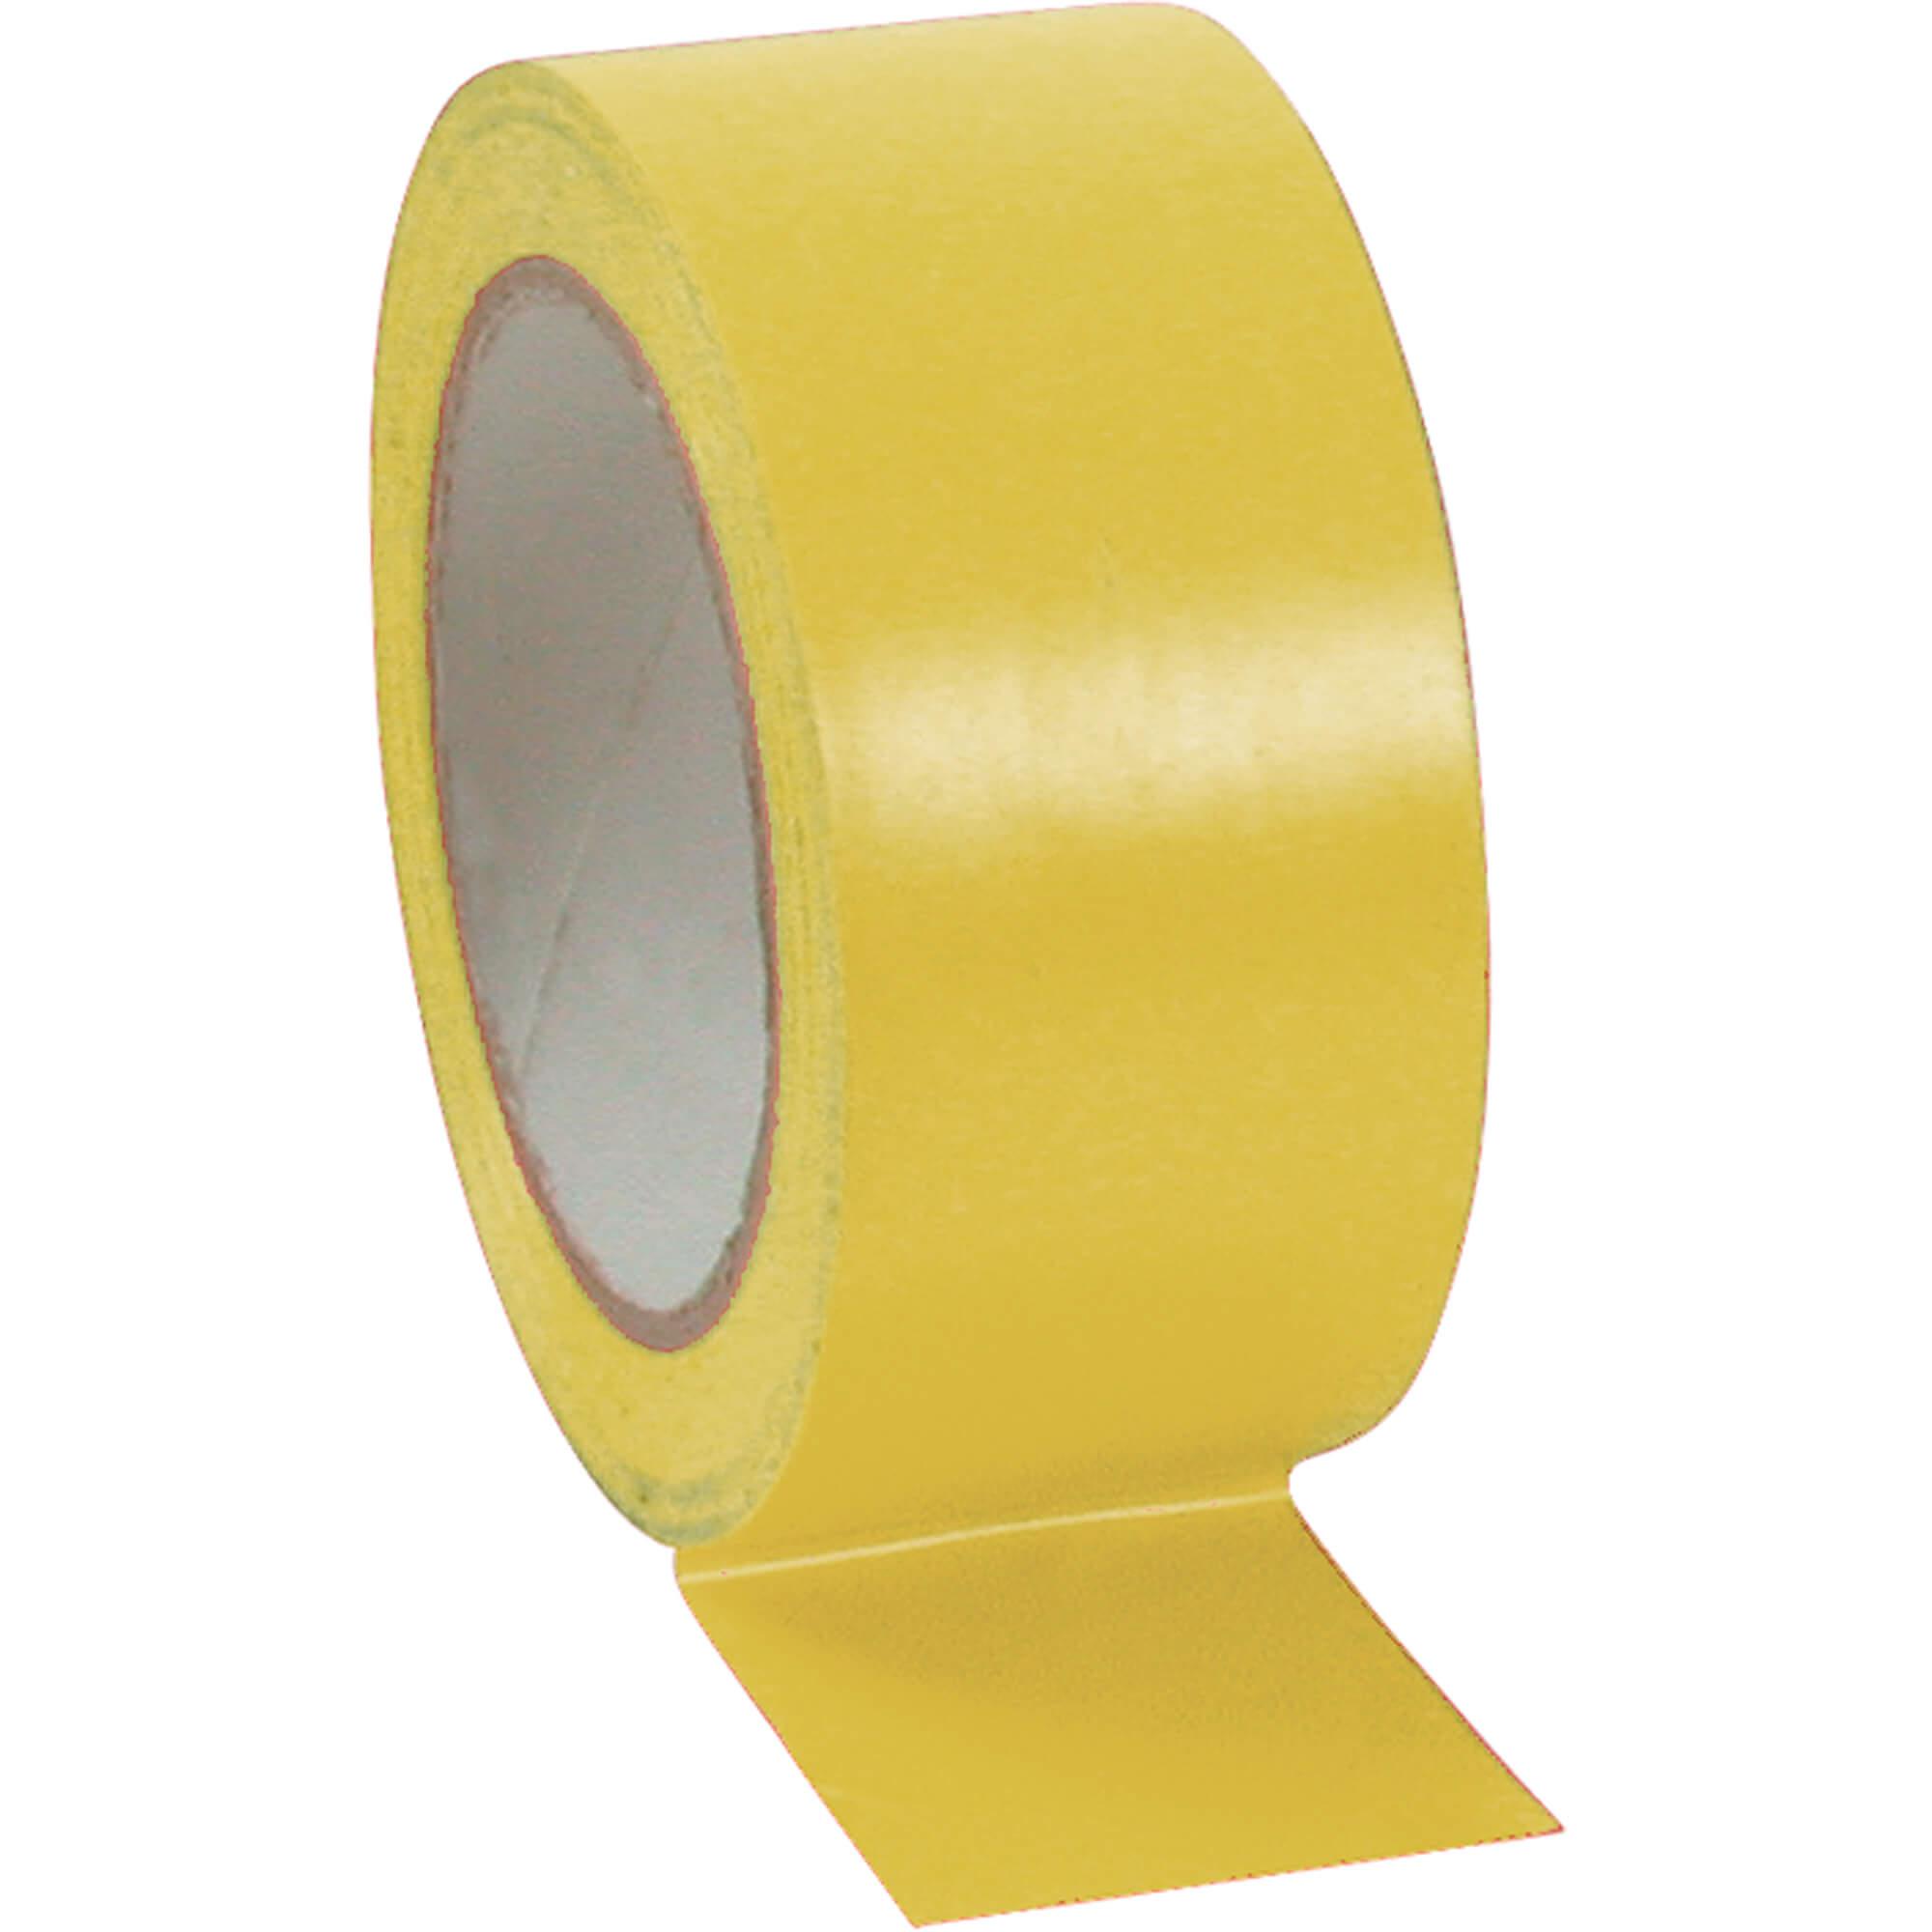 Lane Marking Tape - Yellow Vinyl Tape - 48mm x 33m